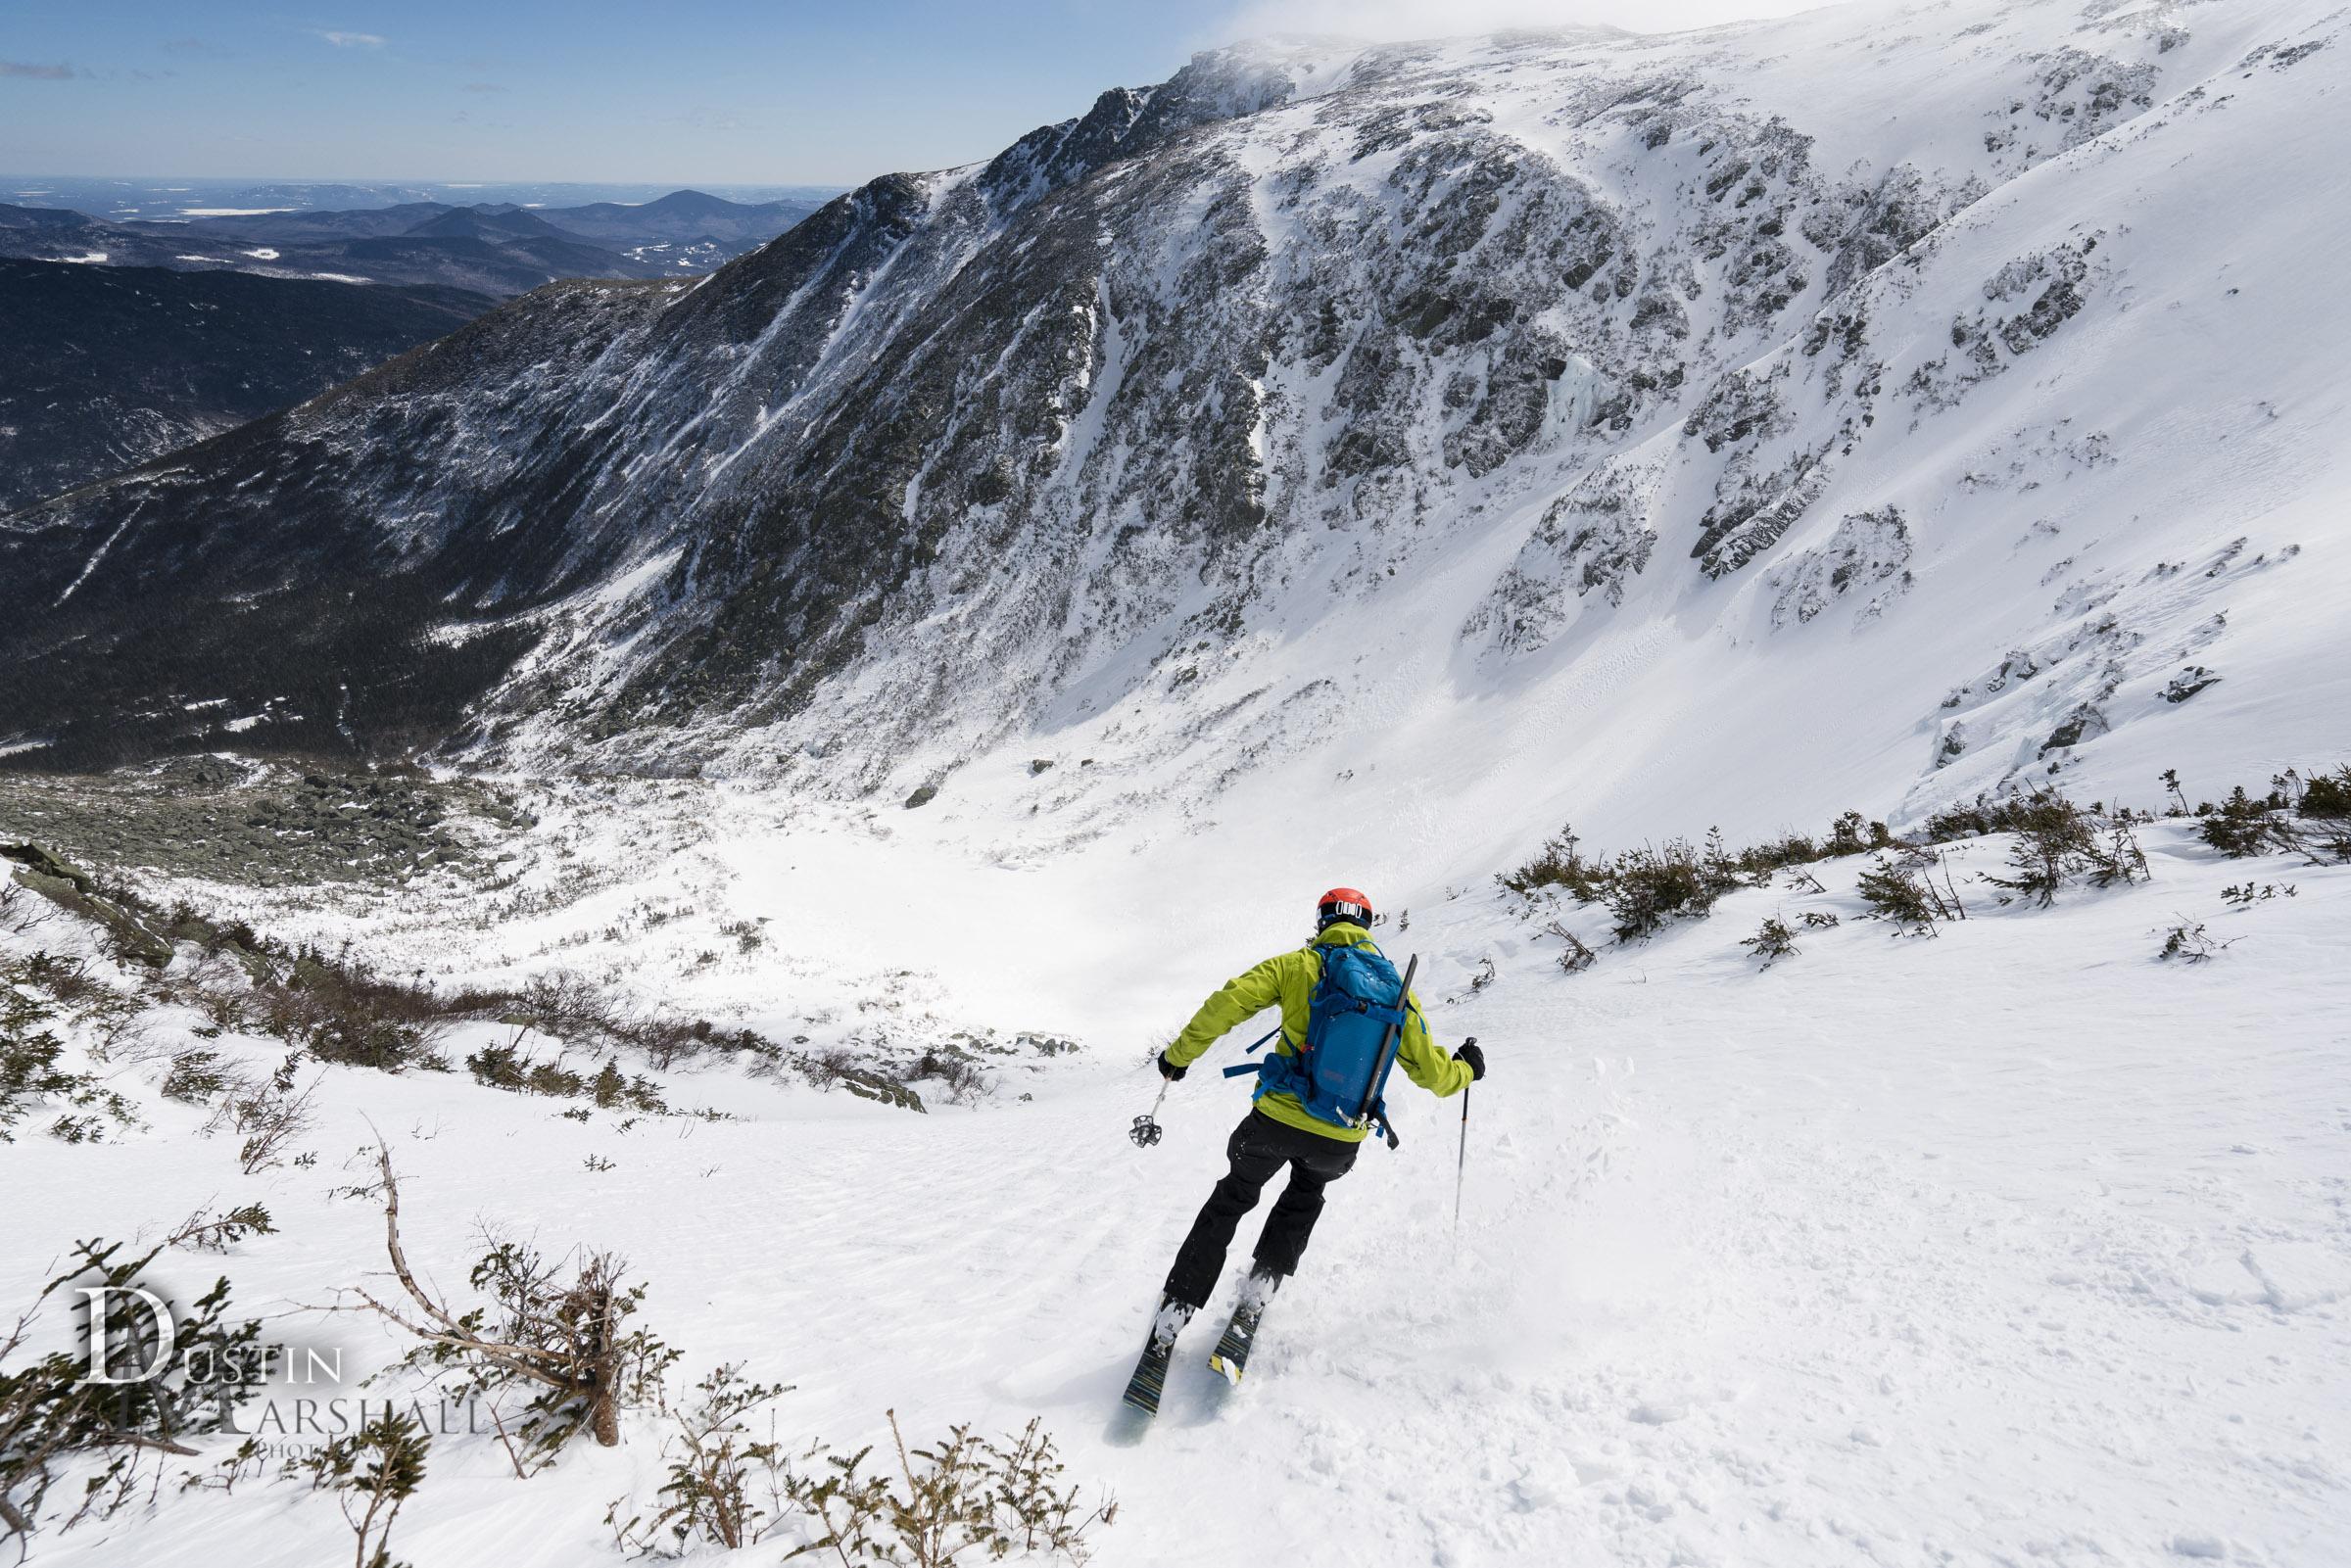 A jump turn at the top of sluice, Tuckerman Ravine